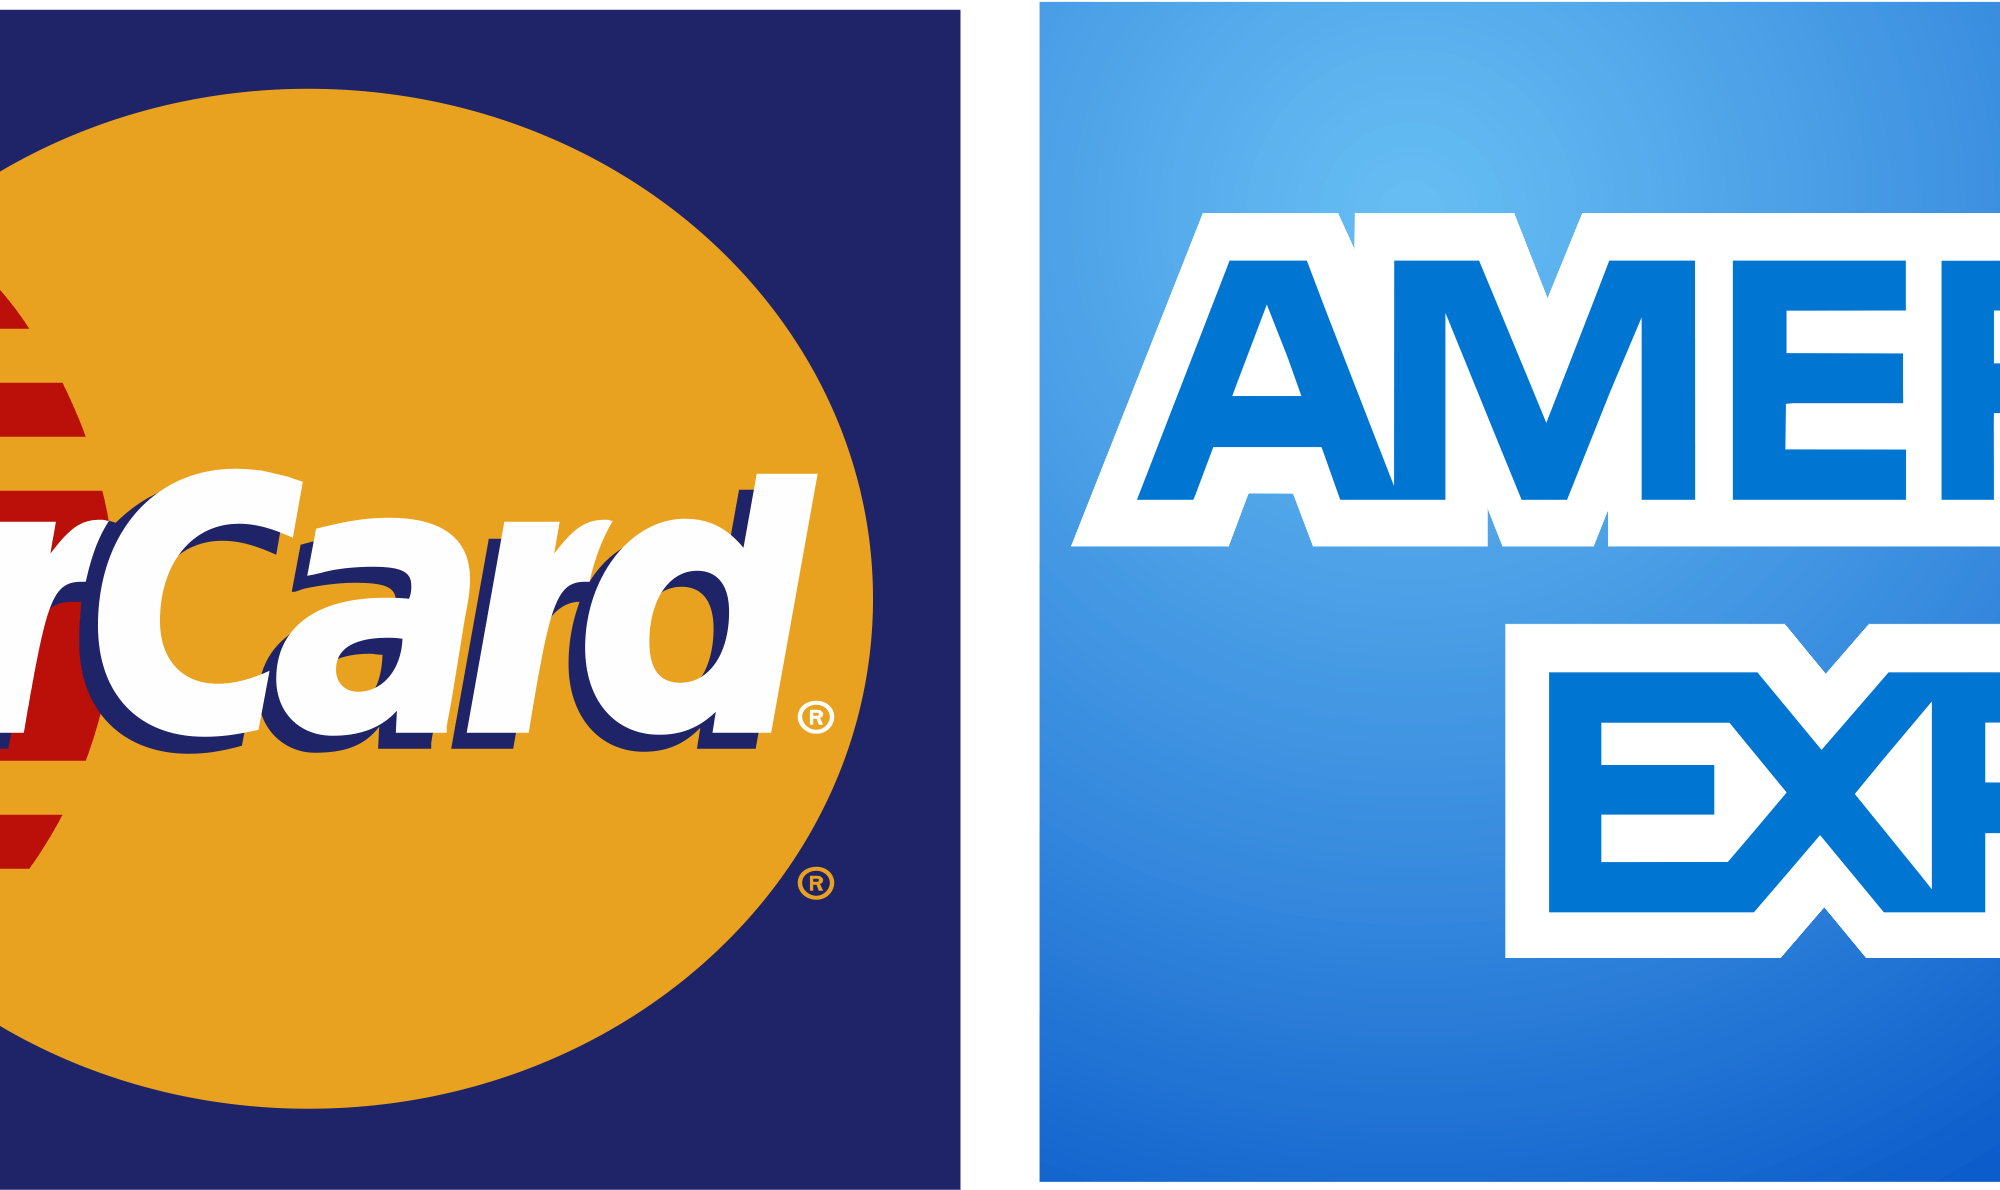 Major Credit Card Logo.